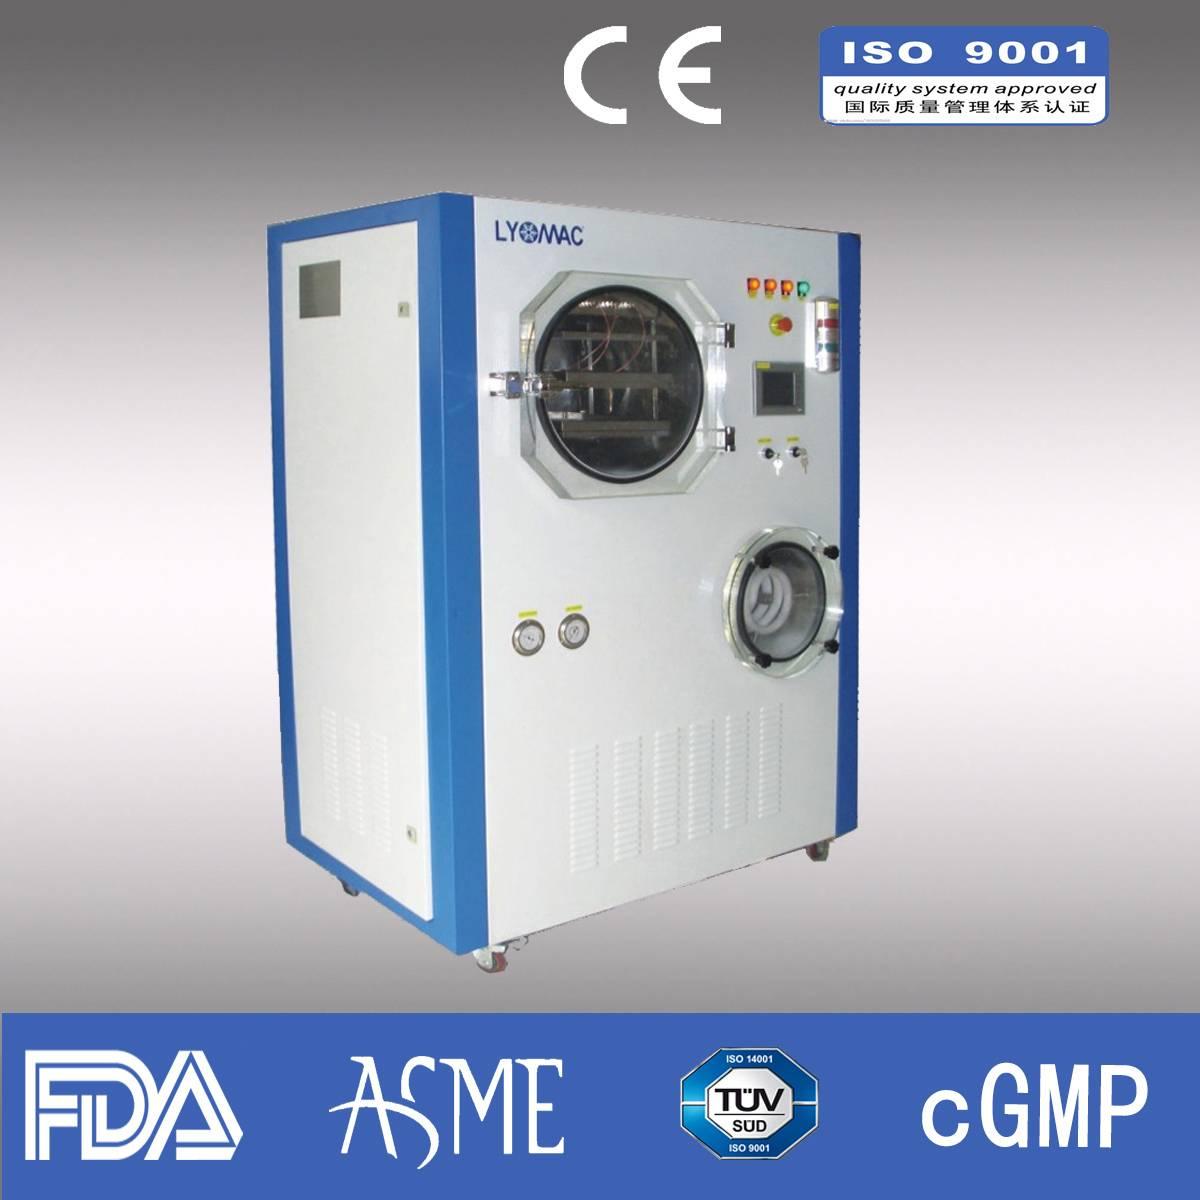 Freeze dryer/ Pharmaceutical freeze dryer/ industrial freeze dryer/Capacity 8kg